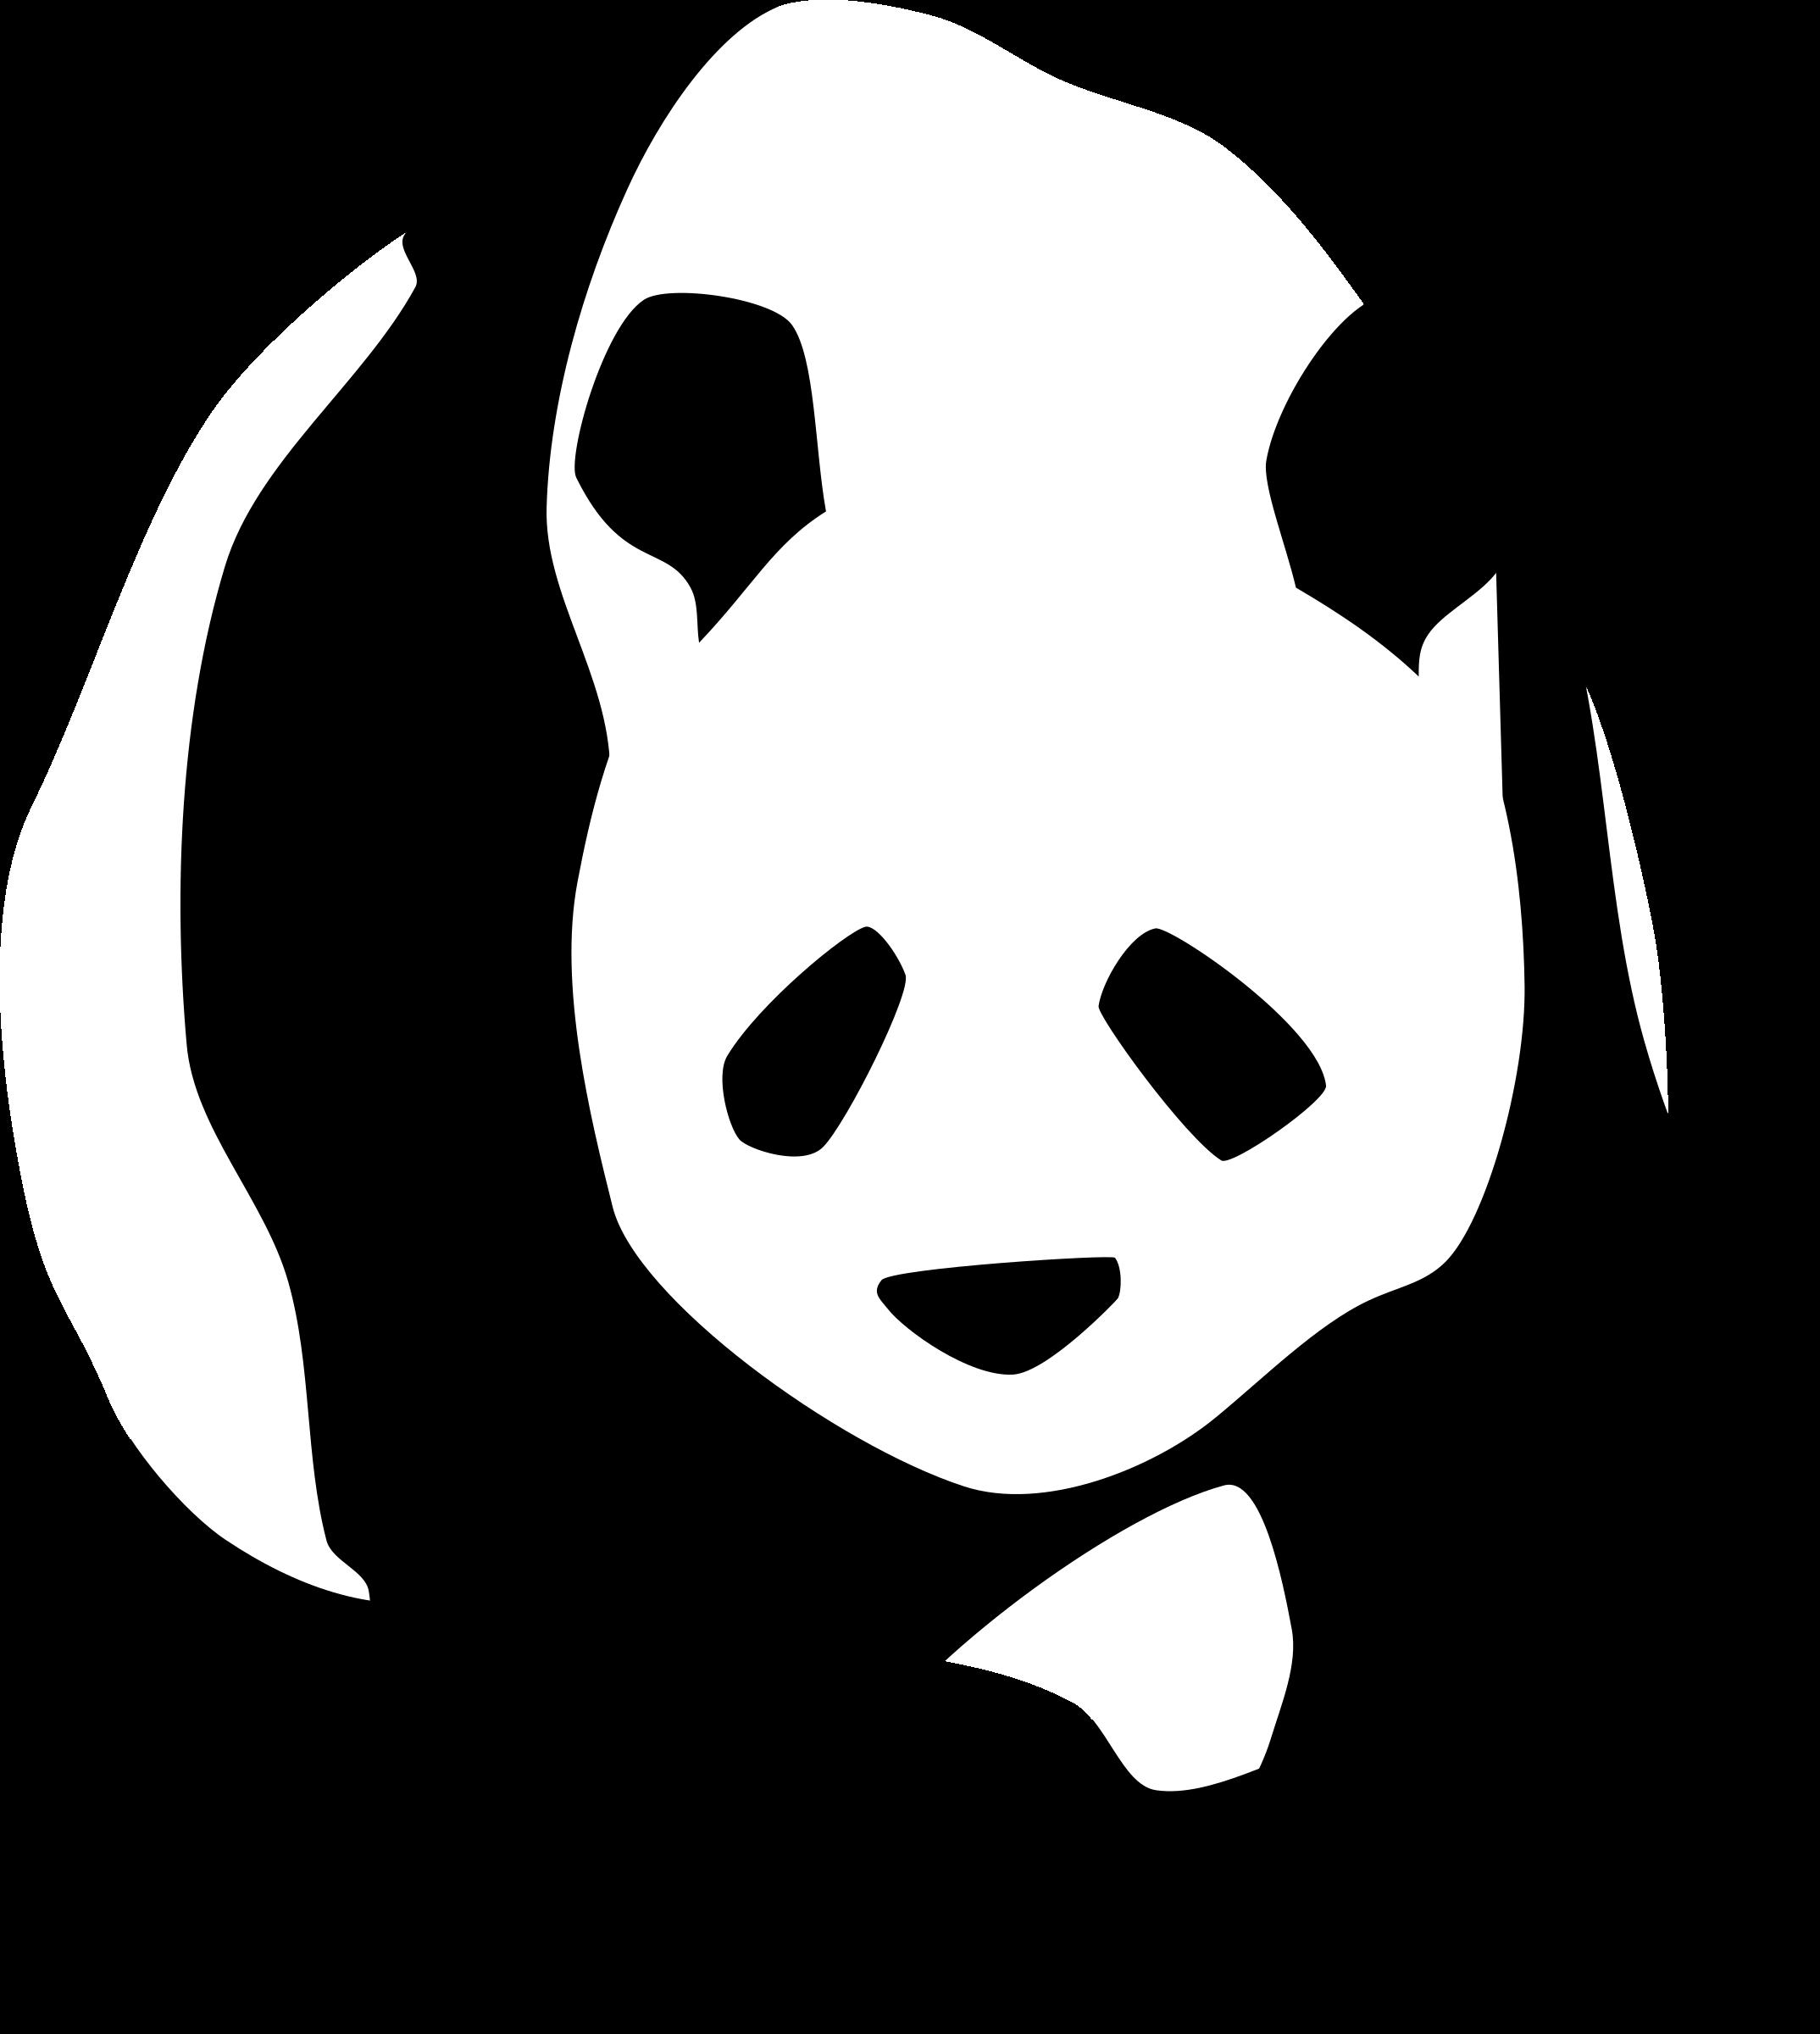 Giant panda big image. Number 1 clipart huge